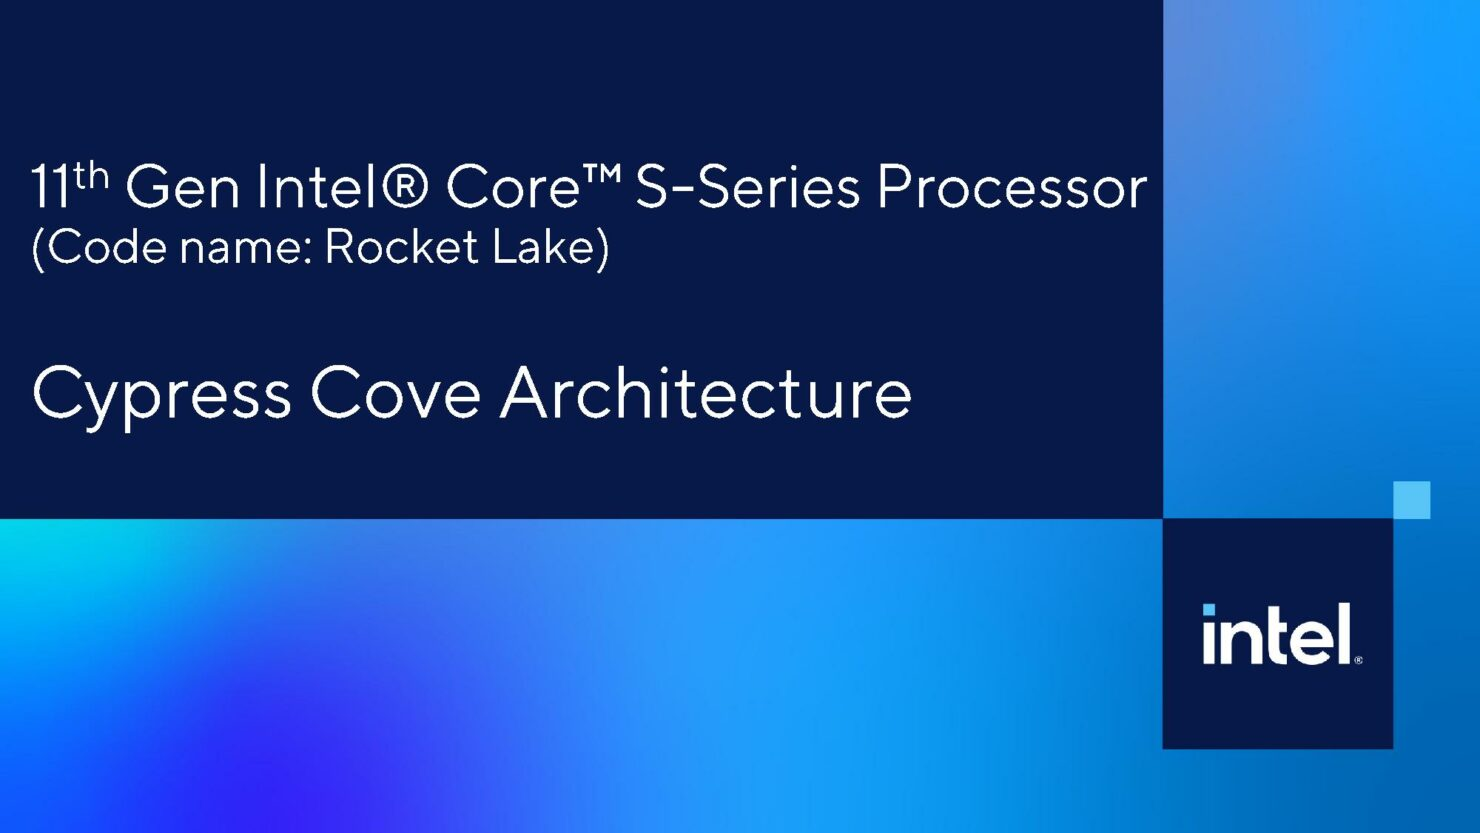 intel-rocket-lake-s-architecture-information-final-10-28-20-page-001